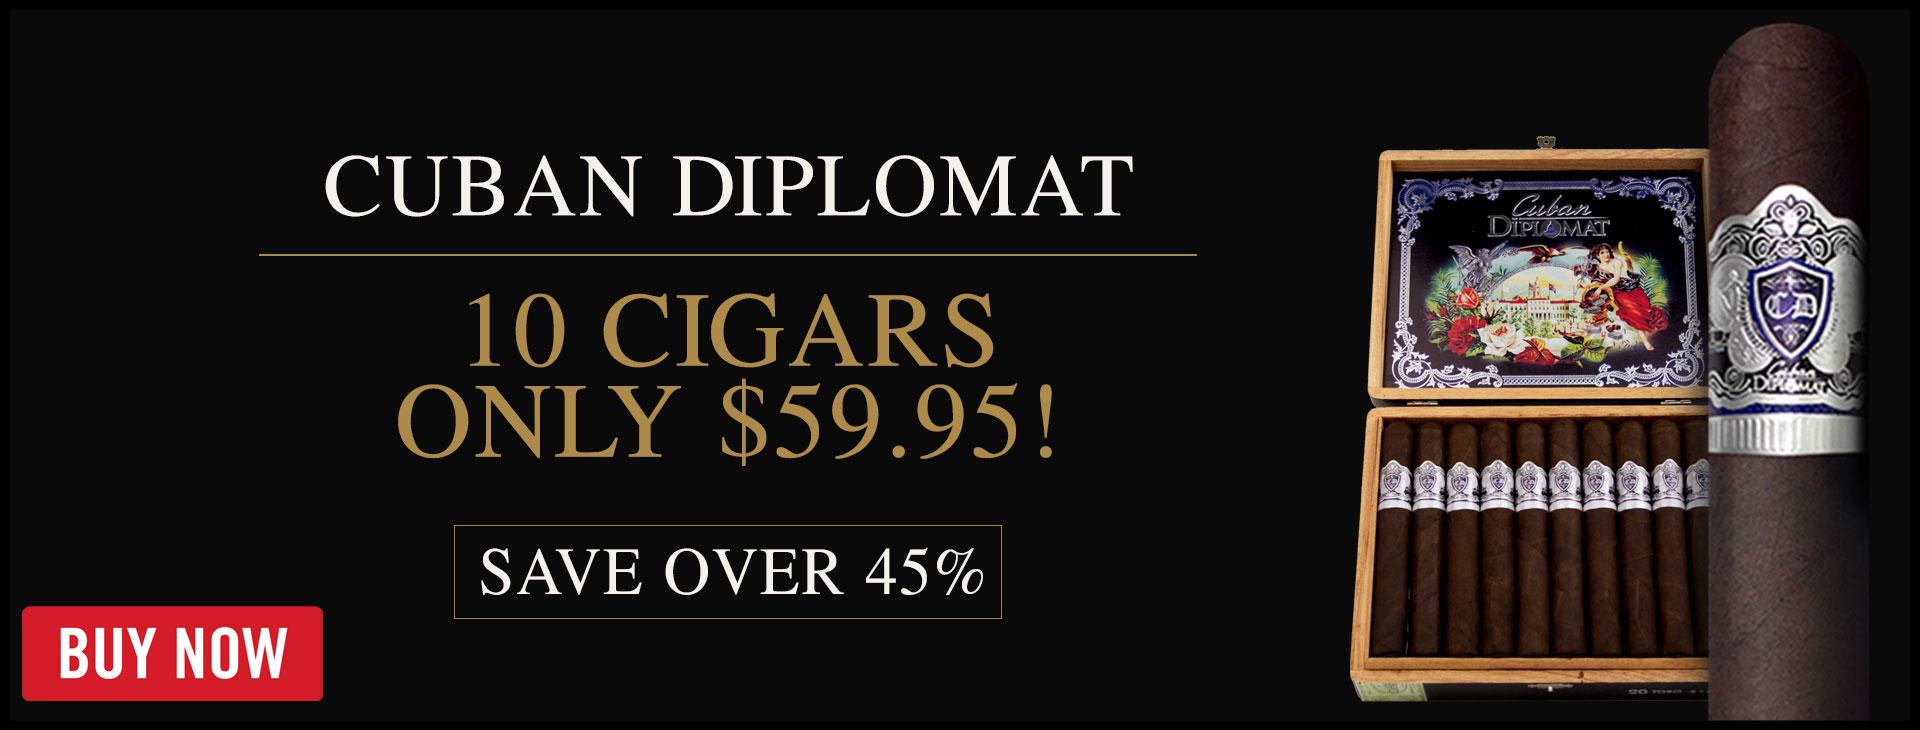 cuban-diplomat-2021-5-banner.jpg